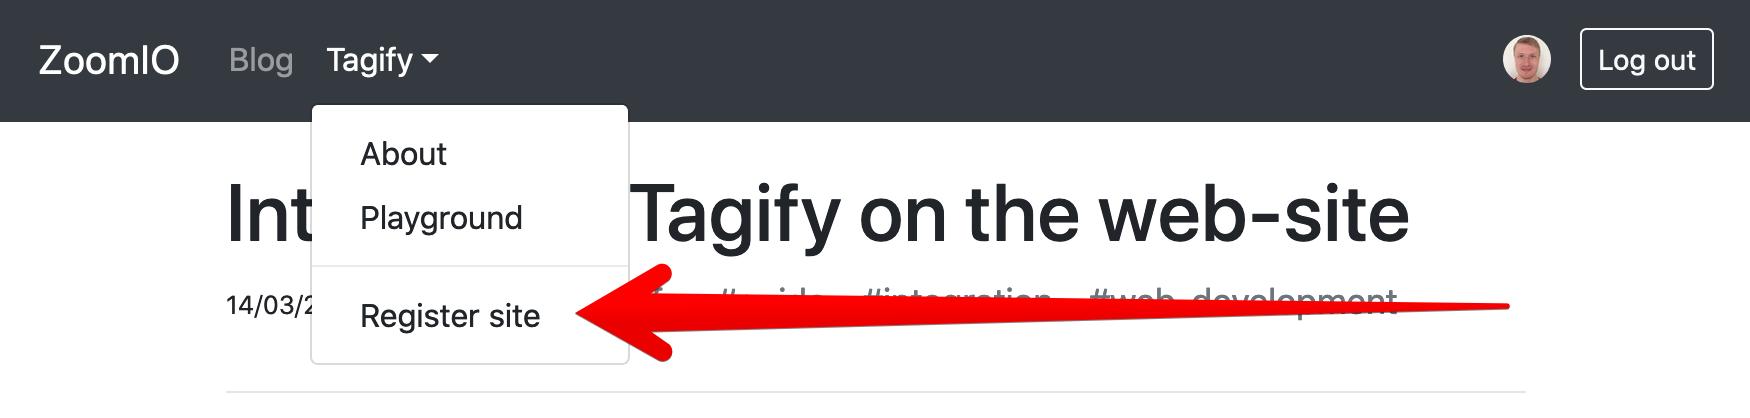 "Tagify ""Register site"""